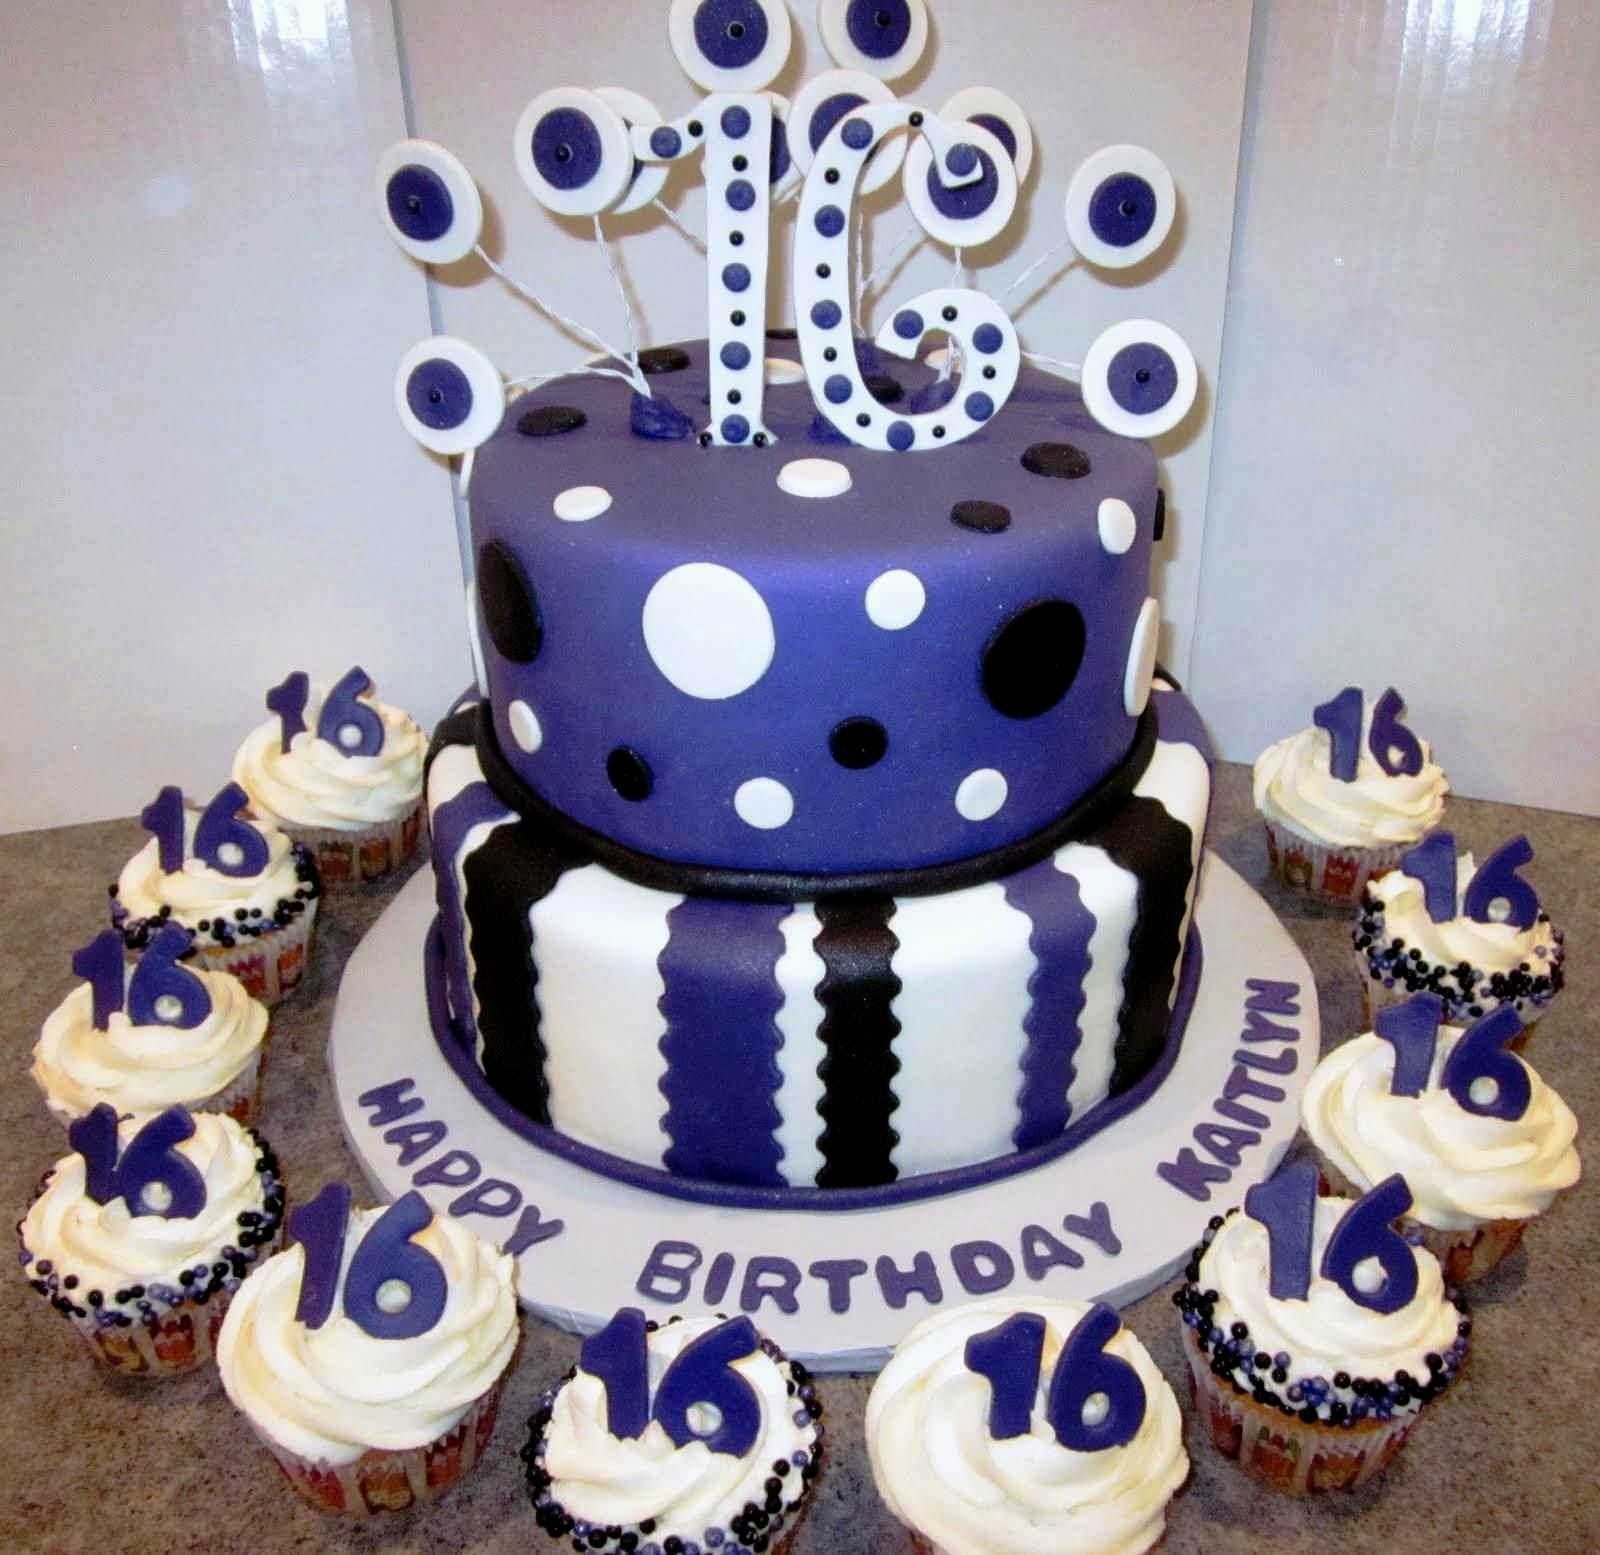 9 16 Boys Birthday Cakes Ideas Photo Boys 16th Birthday Party